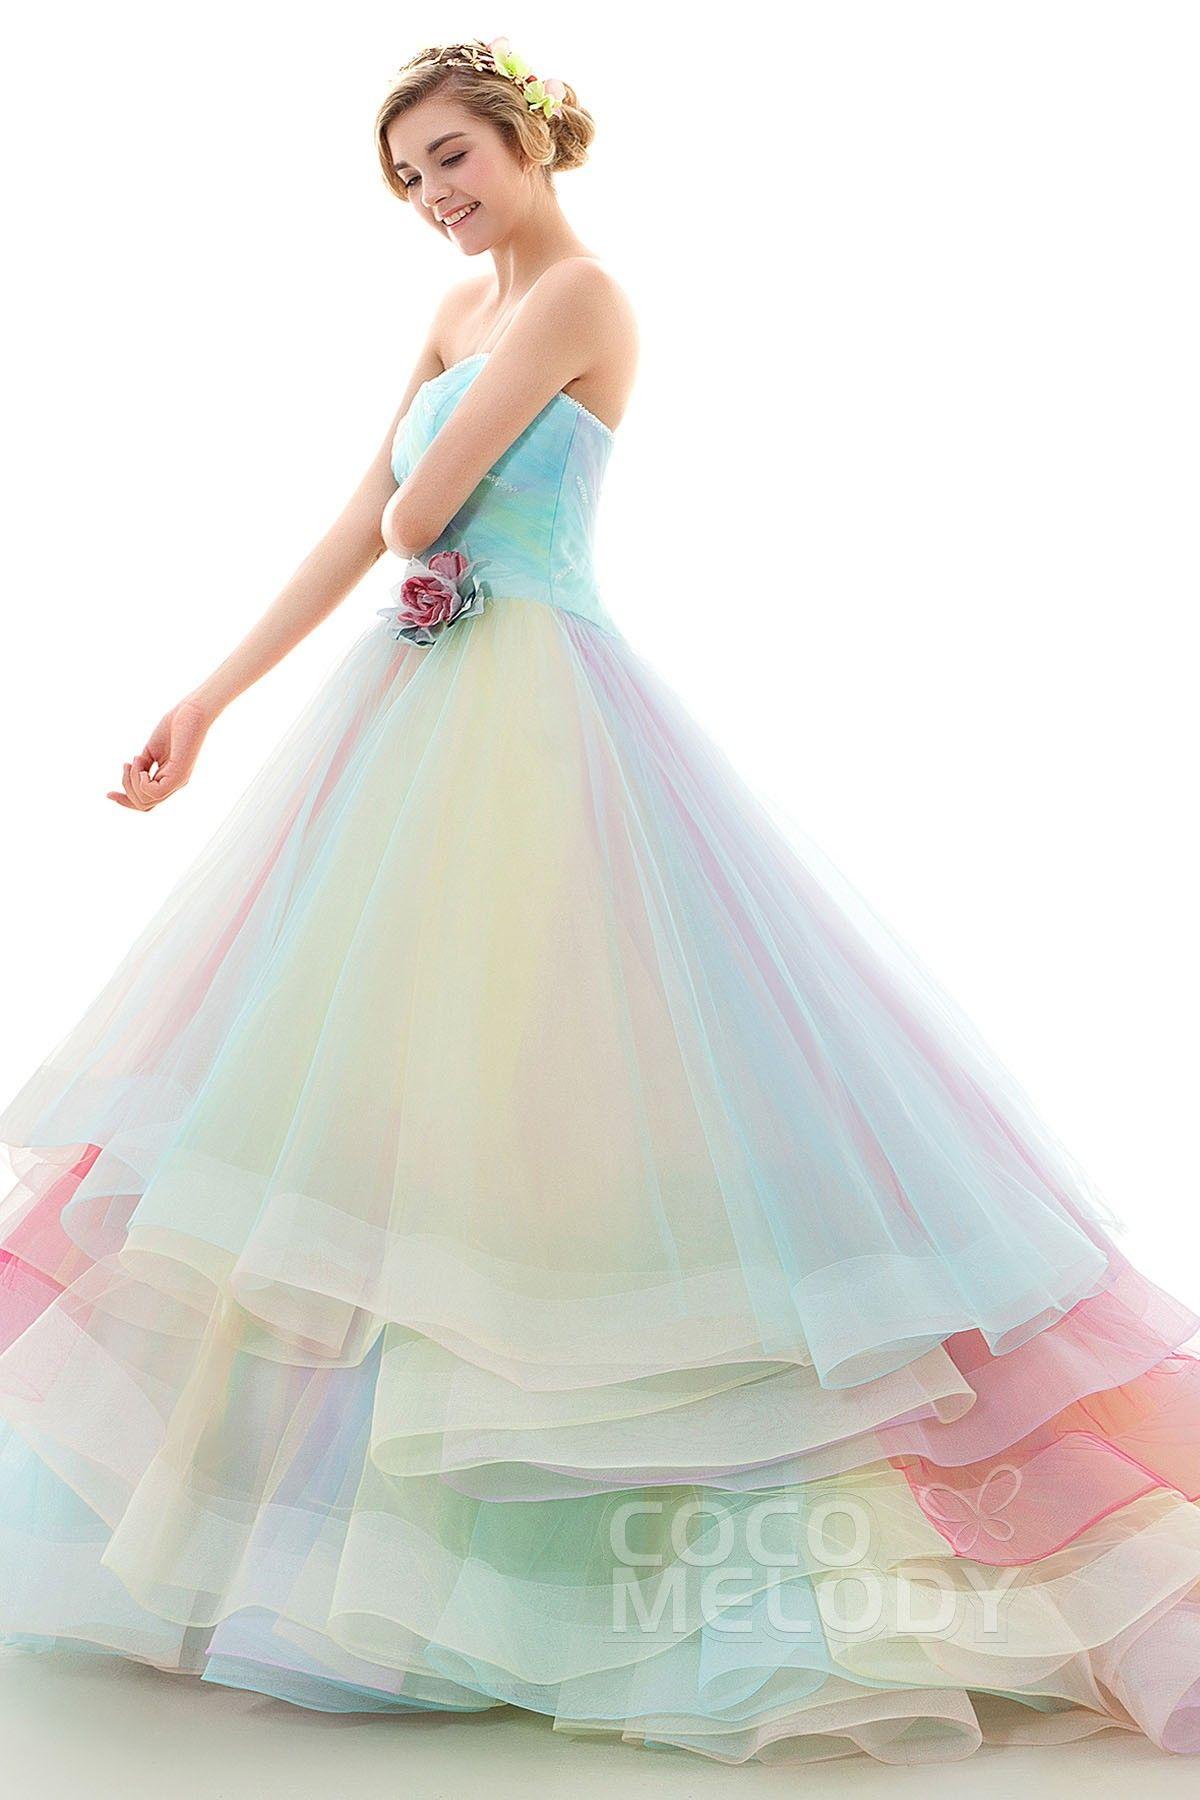 Rainbow Colored Dresses